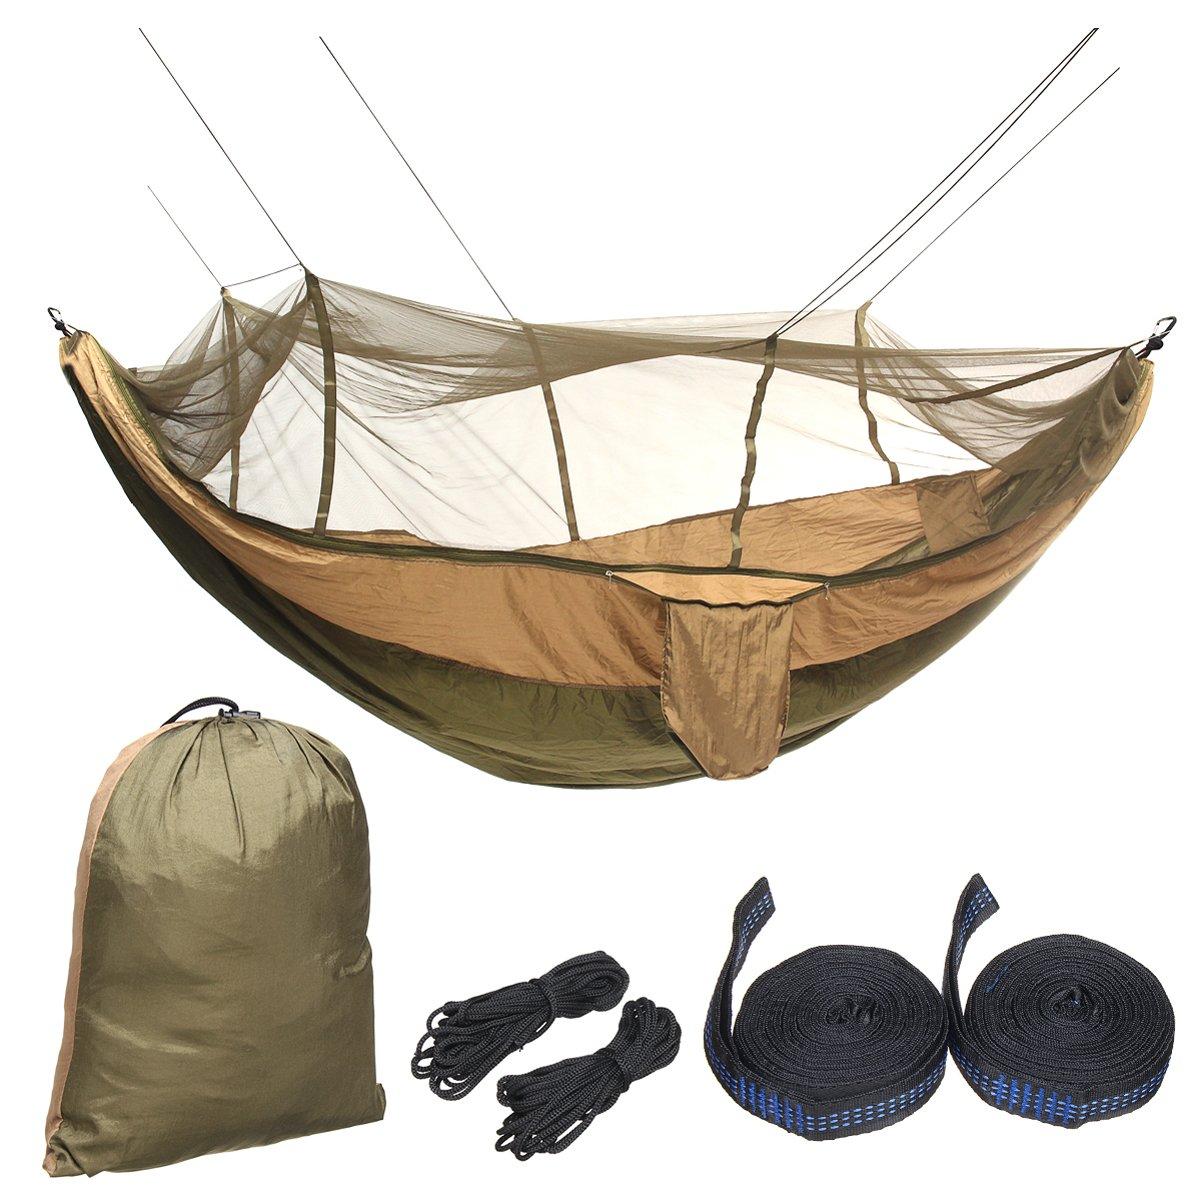 Outdoor 2 Personen Doppelhängematte Camping-Zelt Hanging Schaukel Bett Mit Moskitonetz